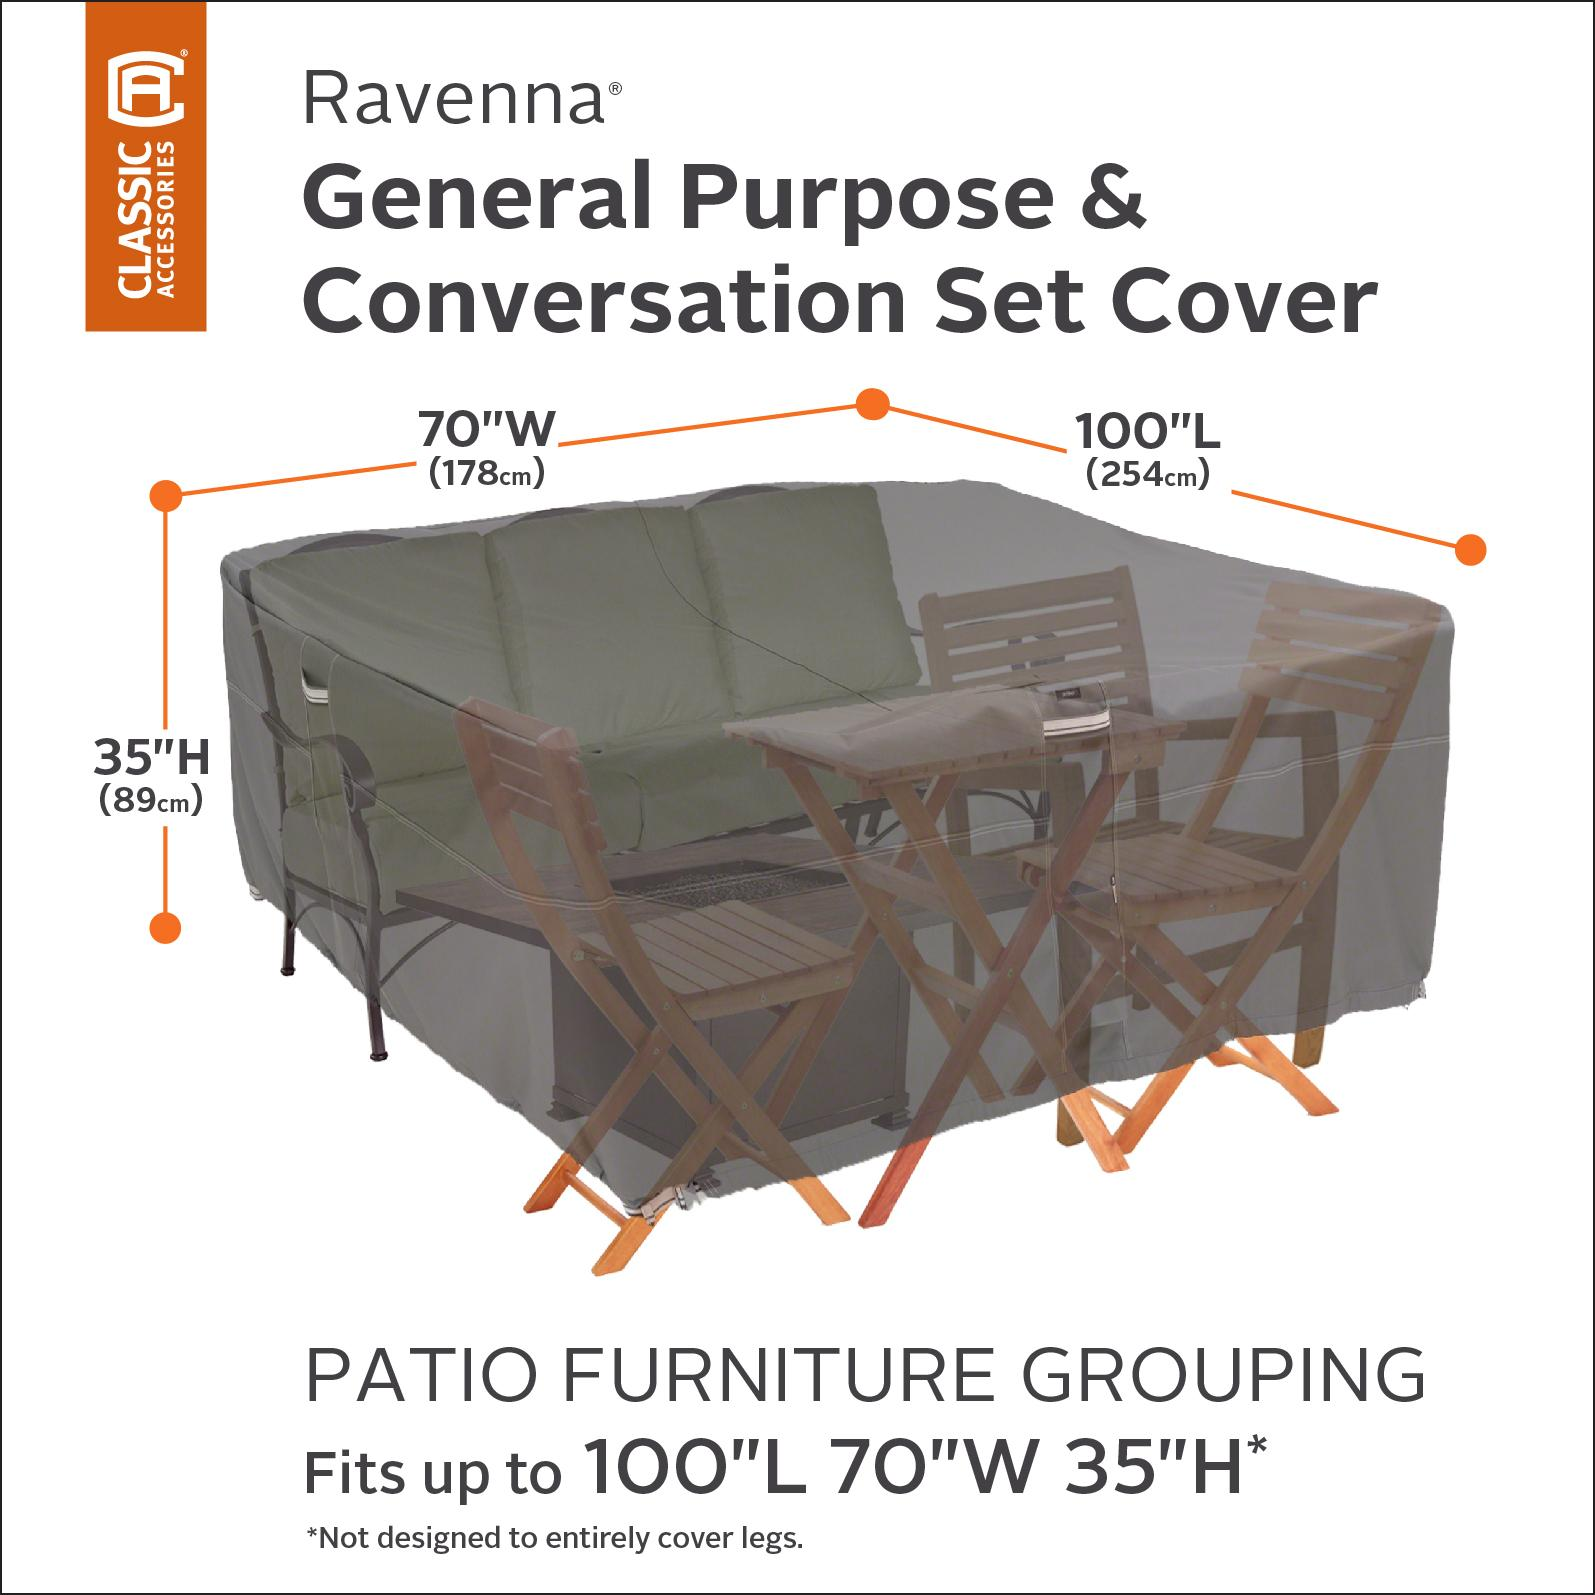 Amazon.com : Classic Accessories 55-457-015101-EC Ravenna